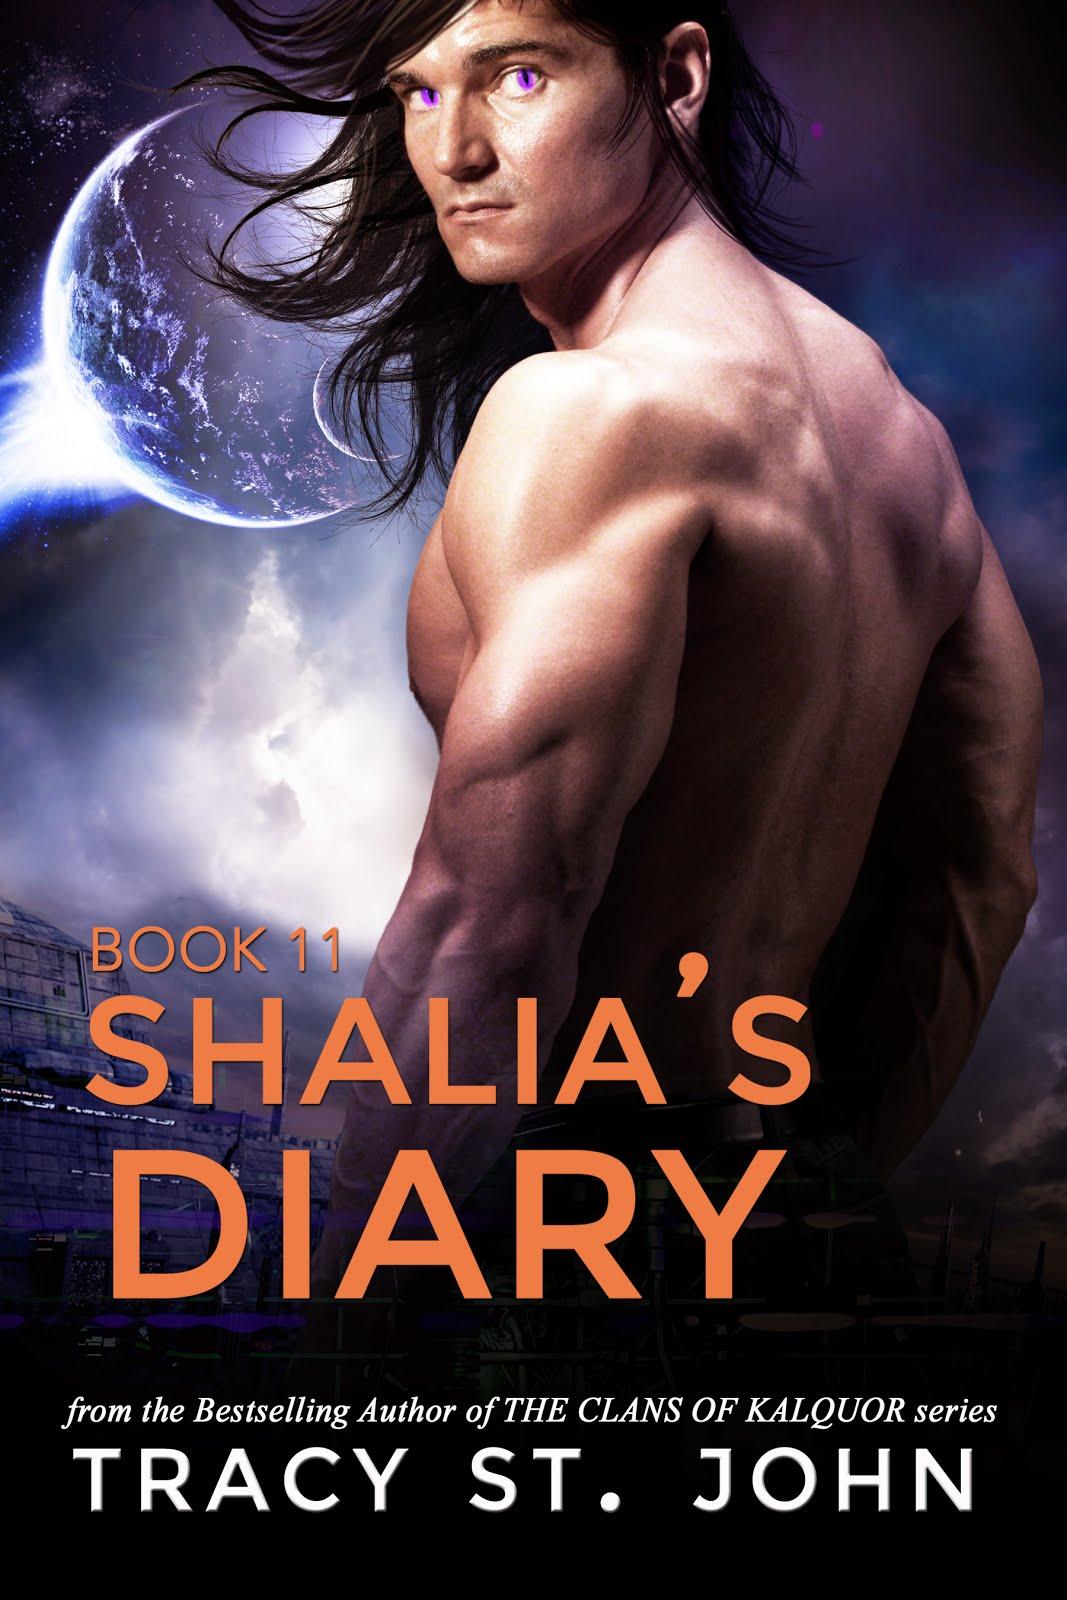 Shalia's Diary Book 11